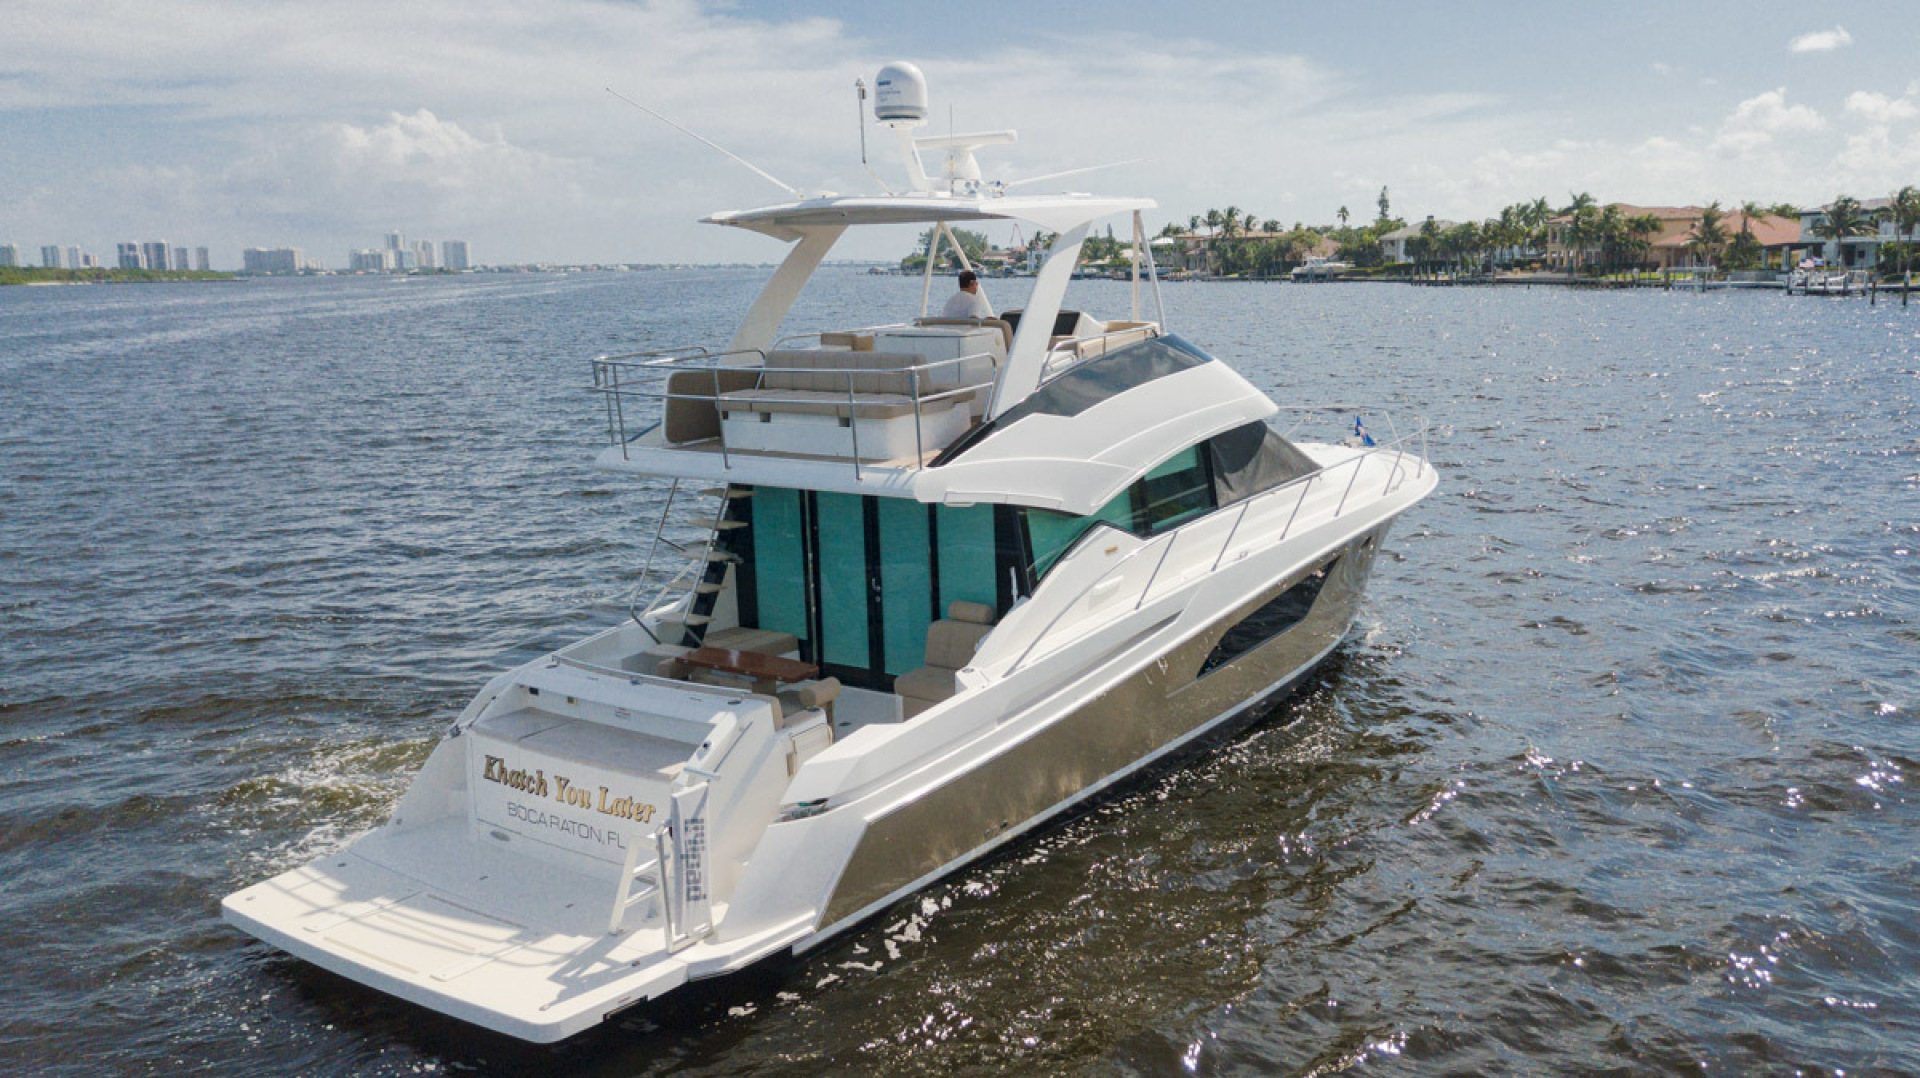 Tiara Yachts-50 Flybridge 2015-Khatch You Later North Palm Beach-Florida-United States-Khatch You Later-1509532 | Thumbnail